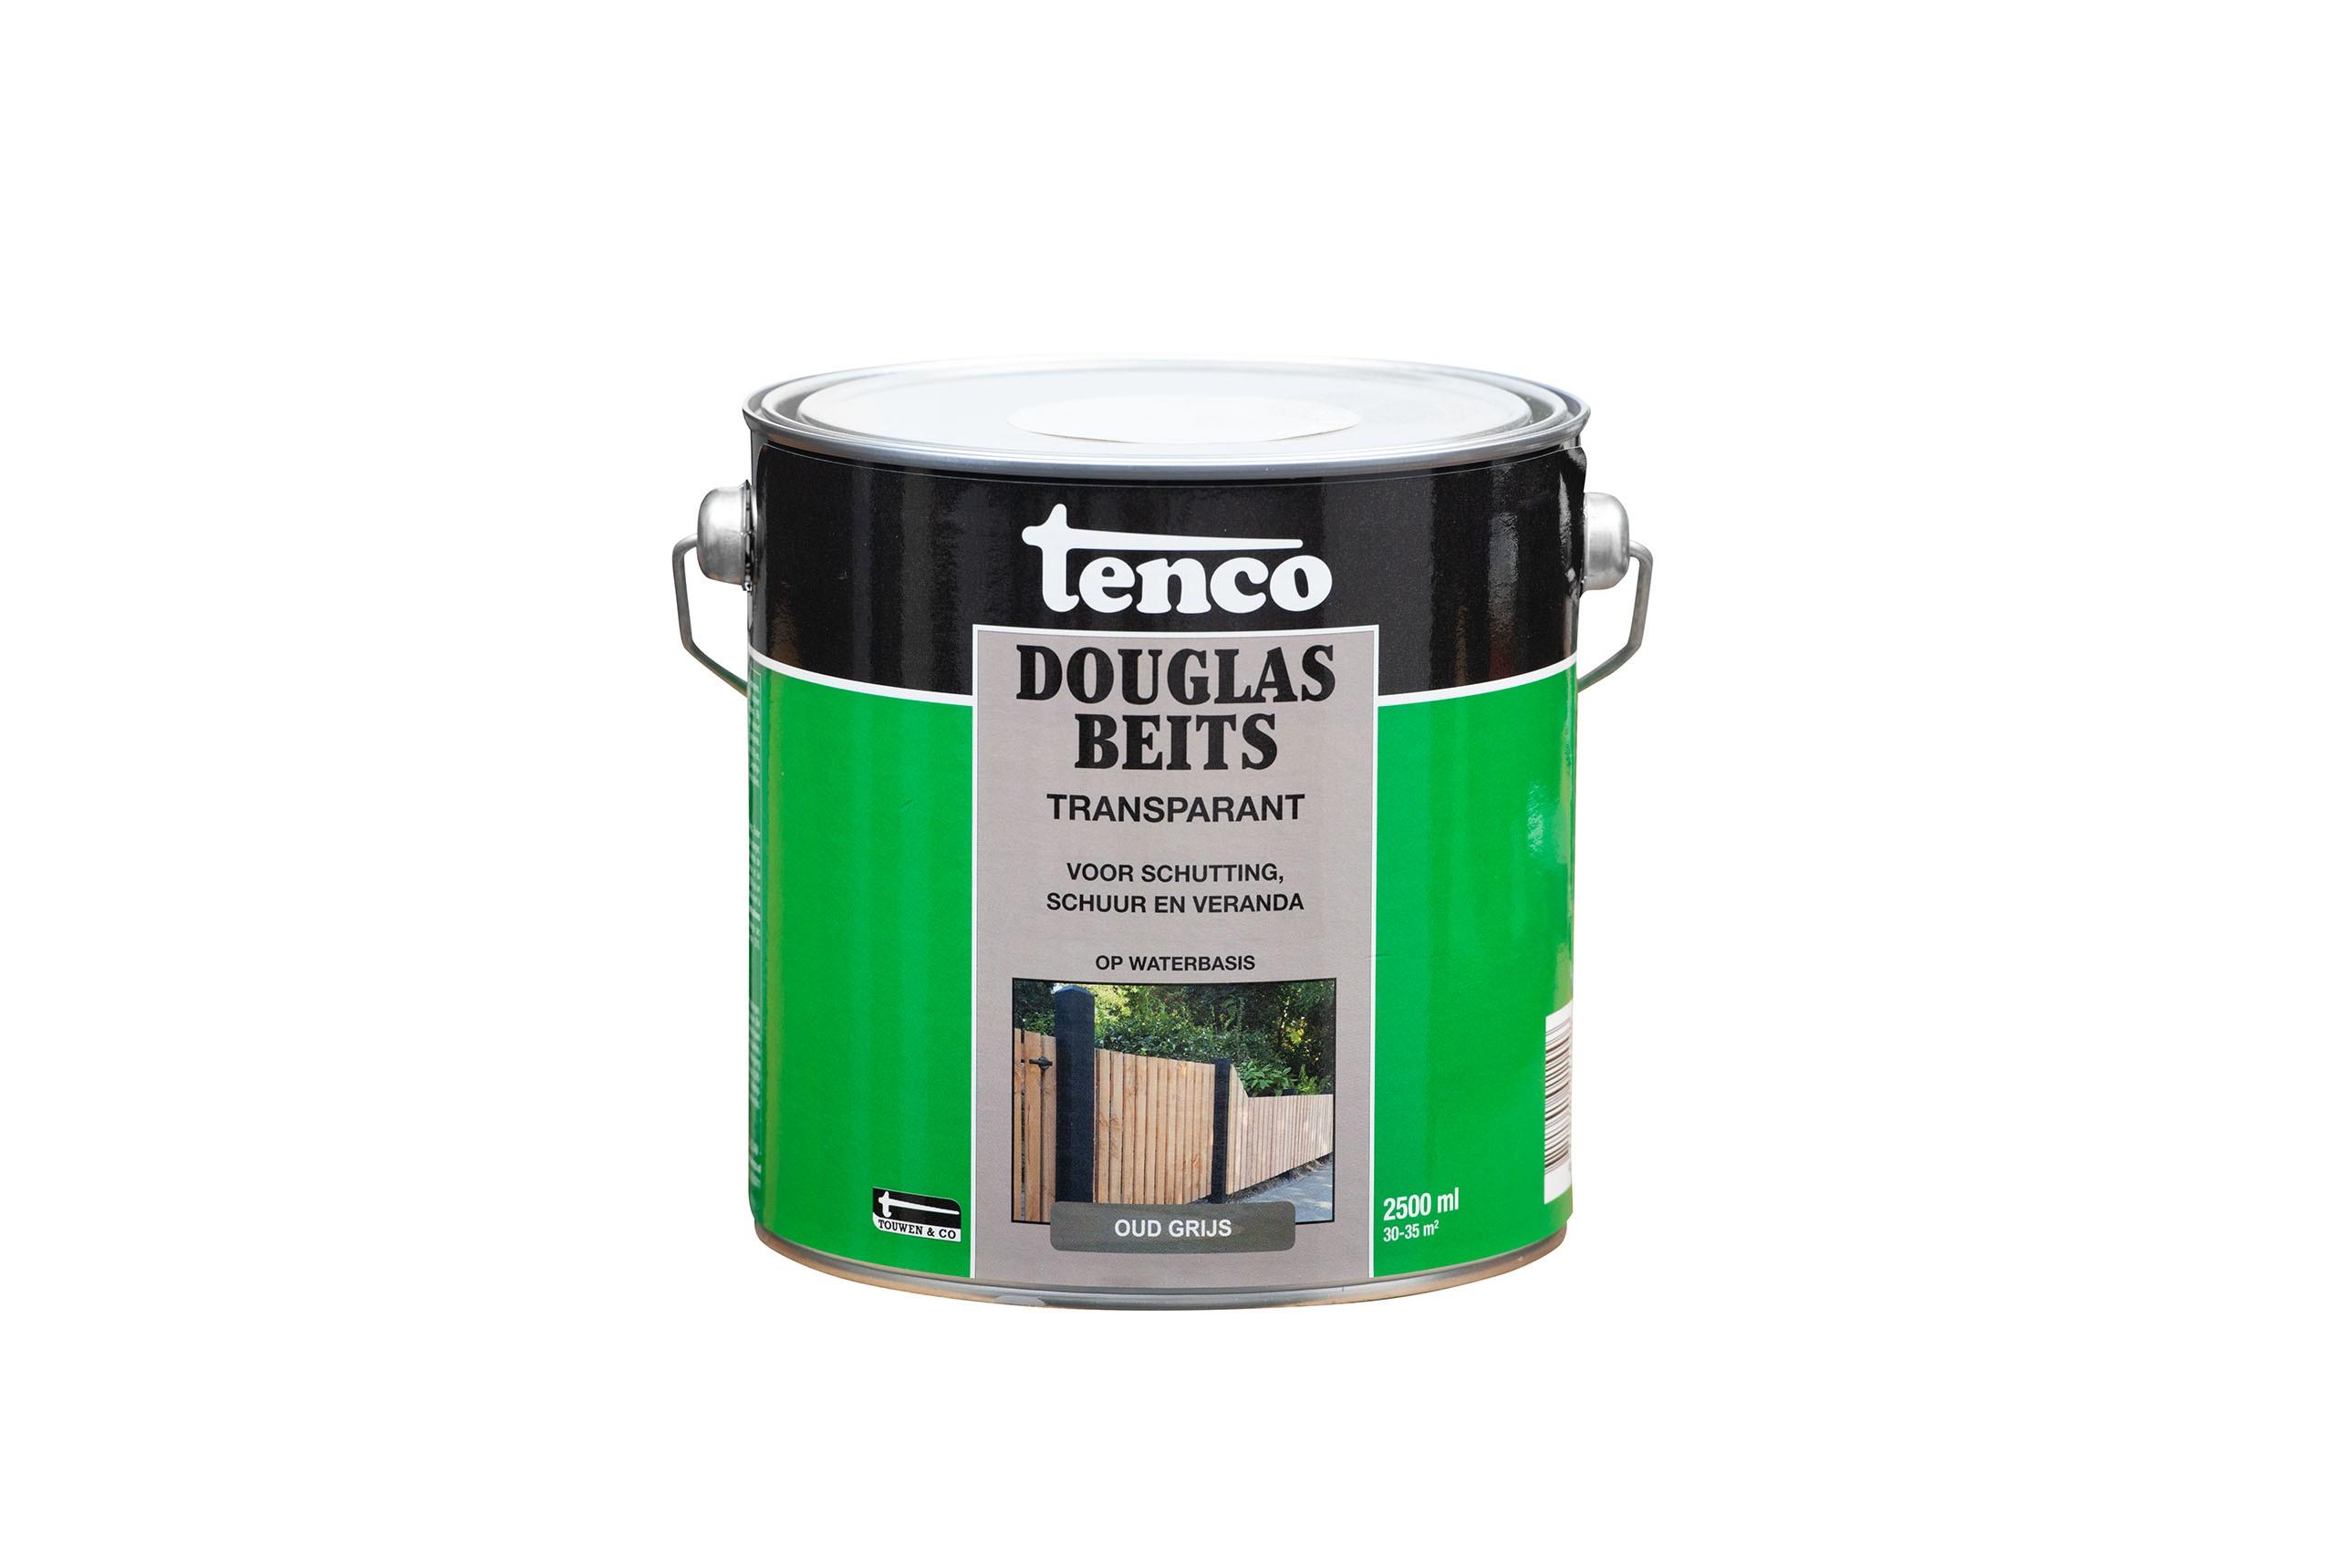 Tenco Douglas beits transparant Oud grijs 2,5 liter